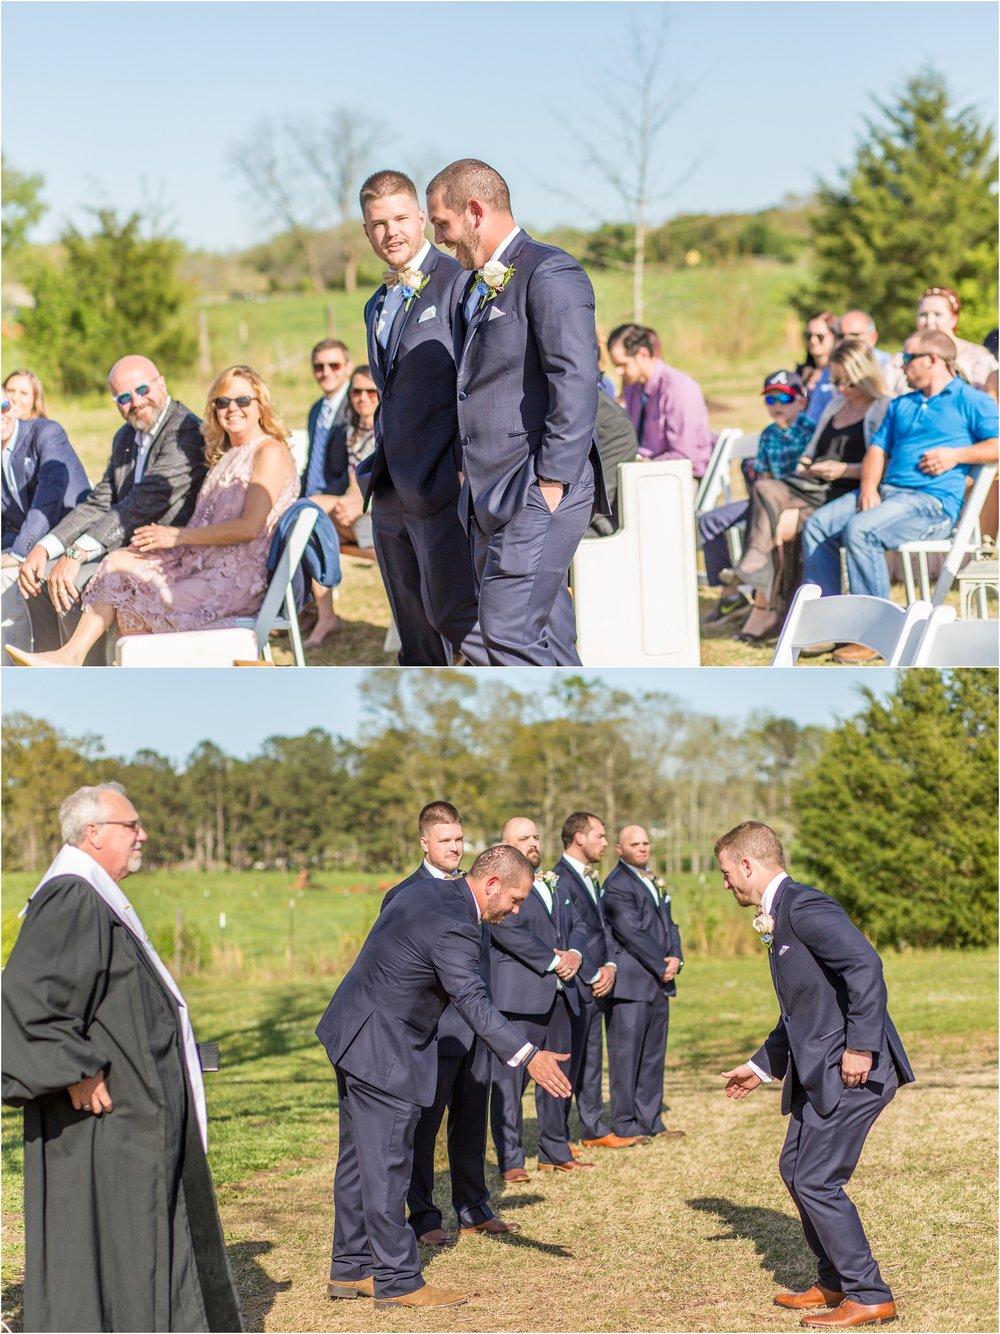 Savannah Eve Photography- Wade Wedding-43.jpg